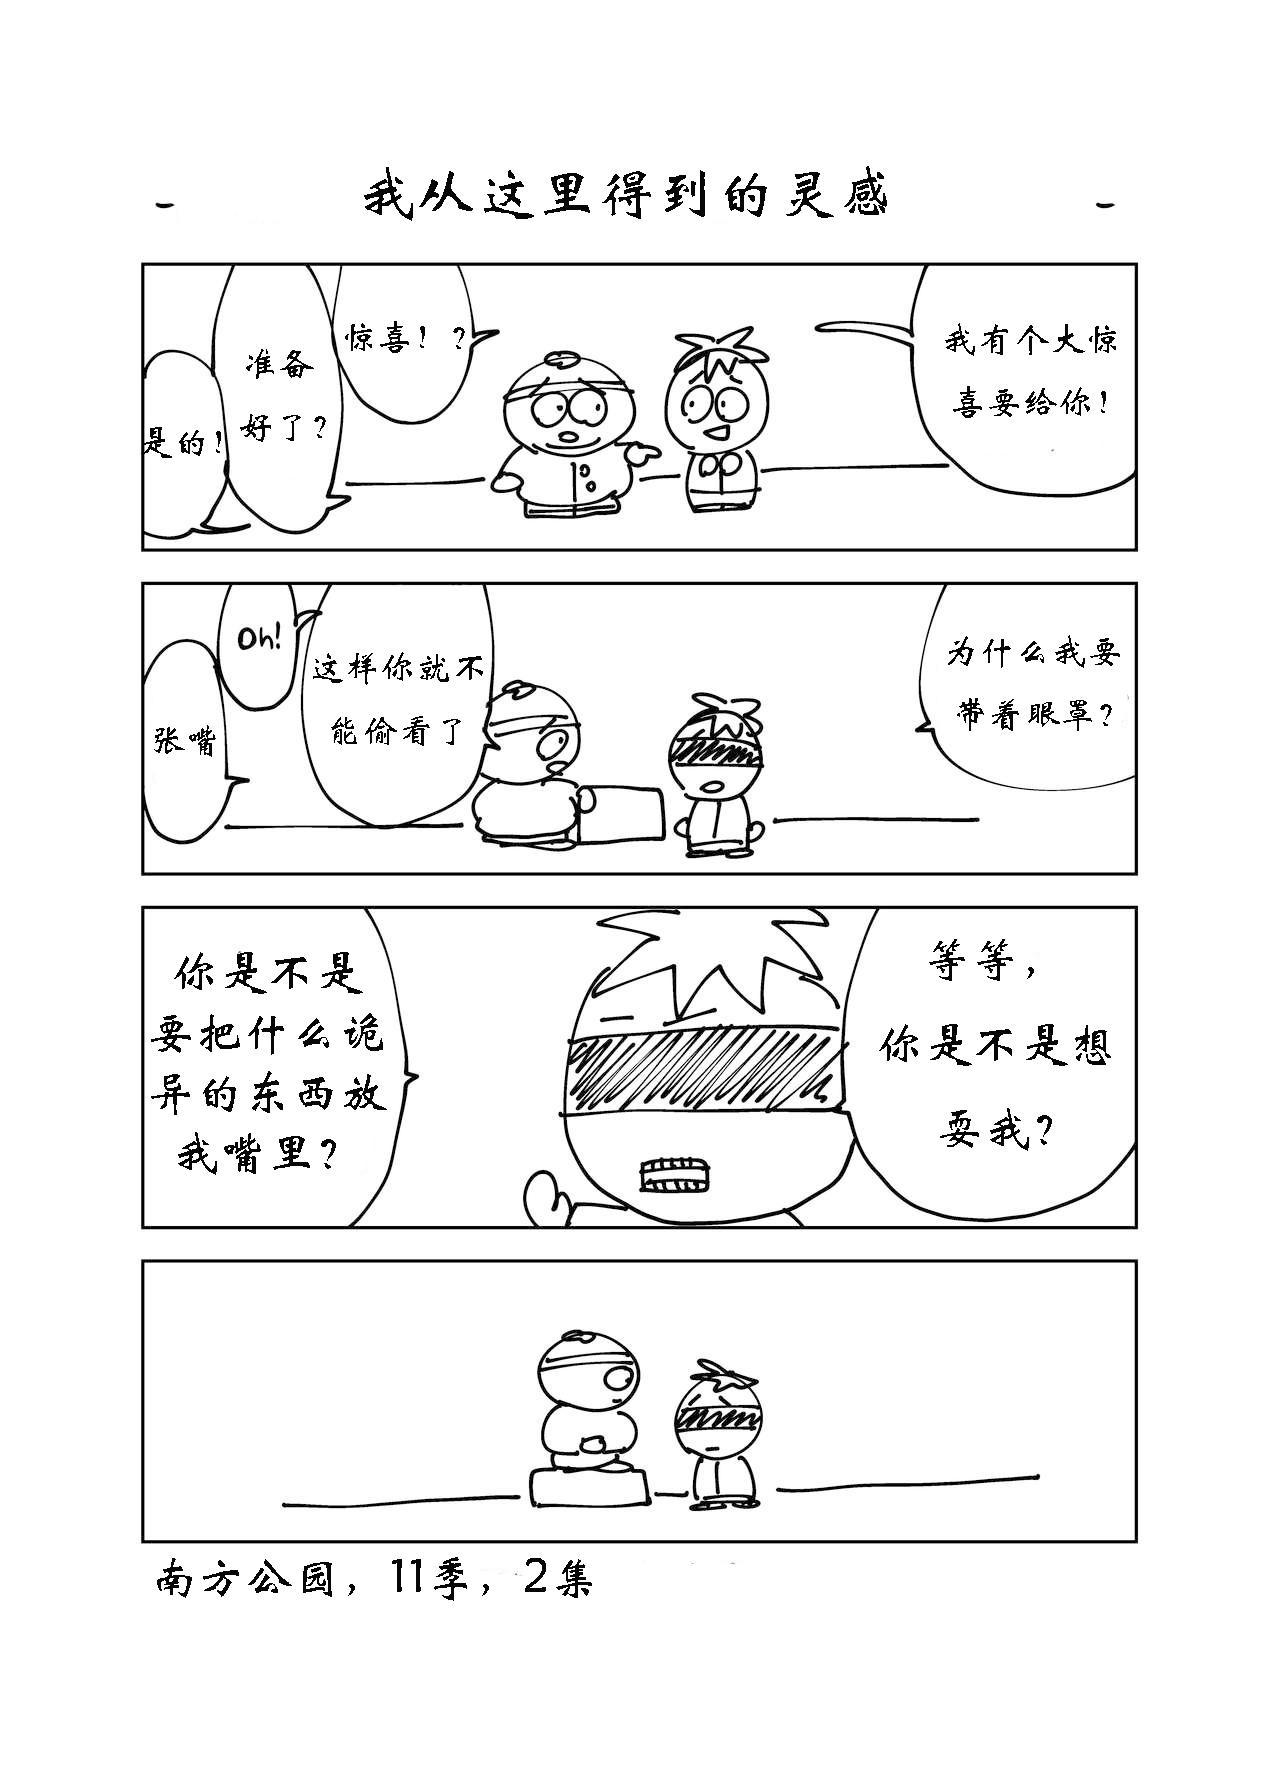 Herachiozukushi 22